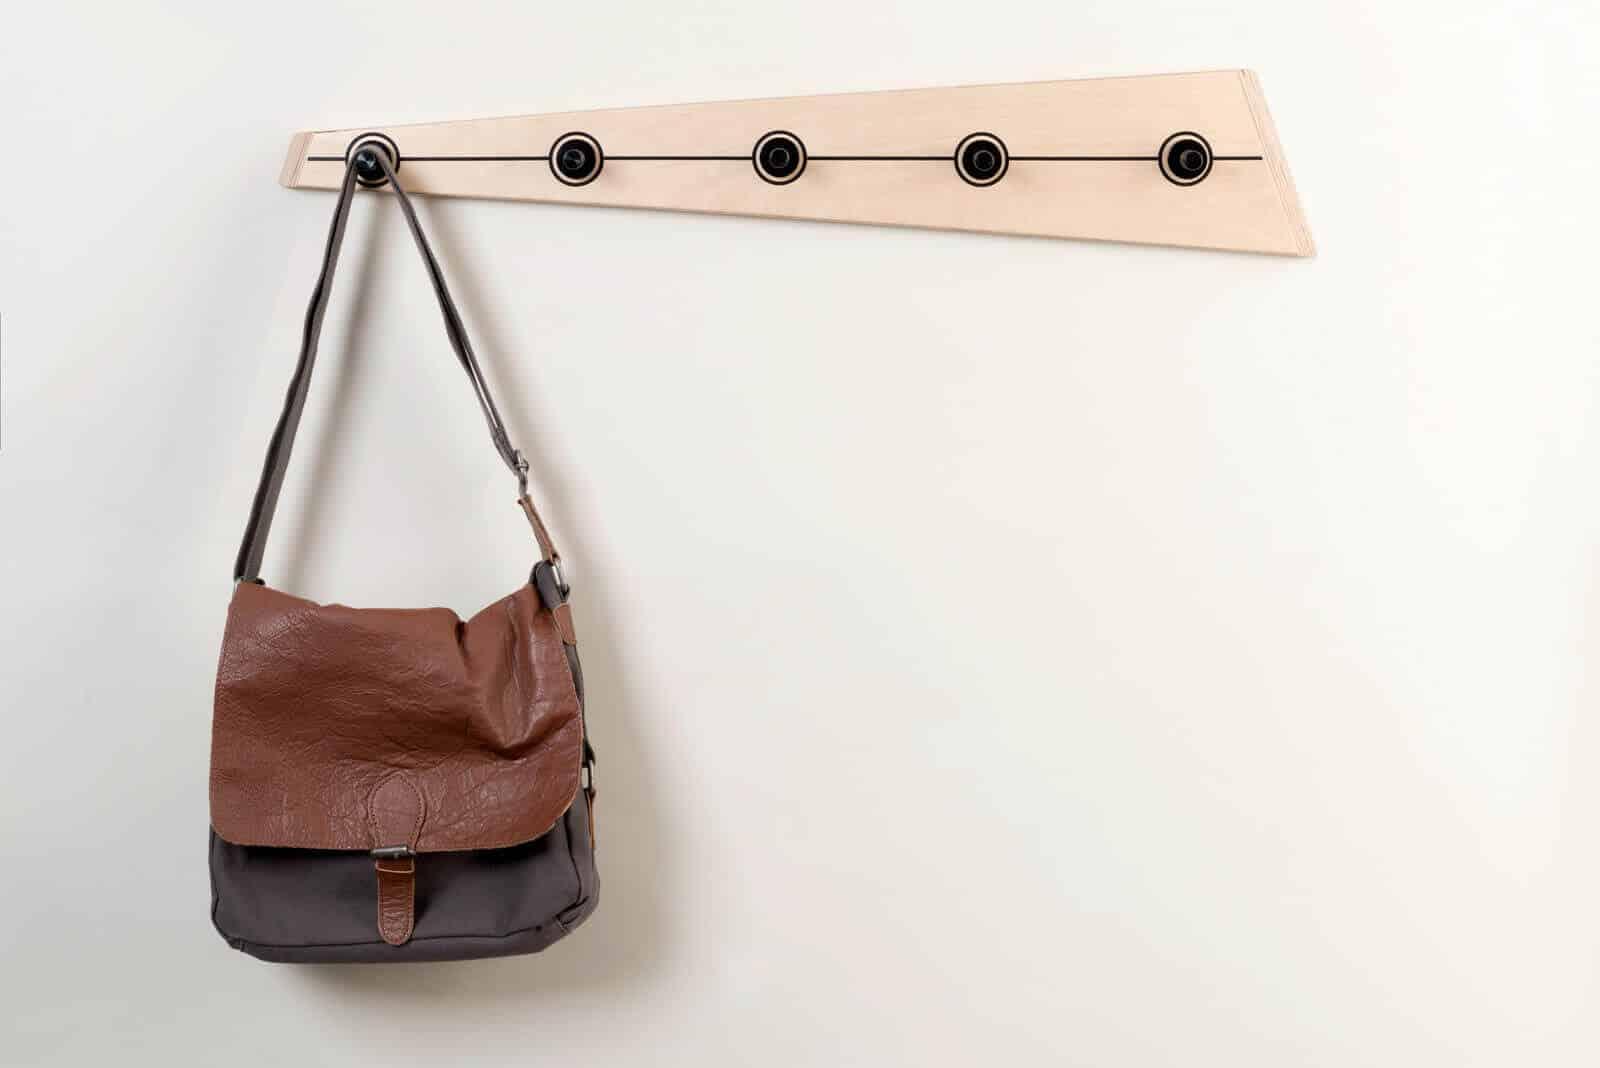 DIY handbag and Coat Rack